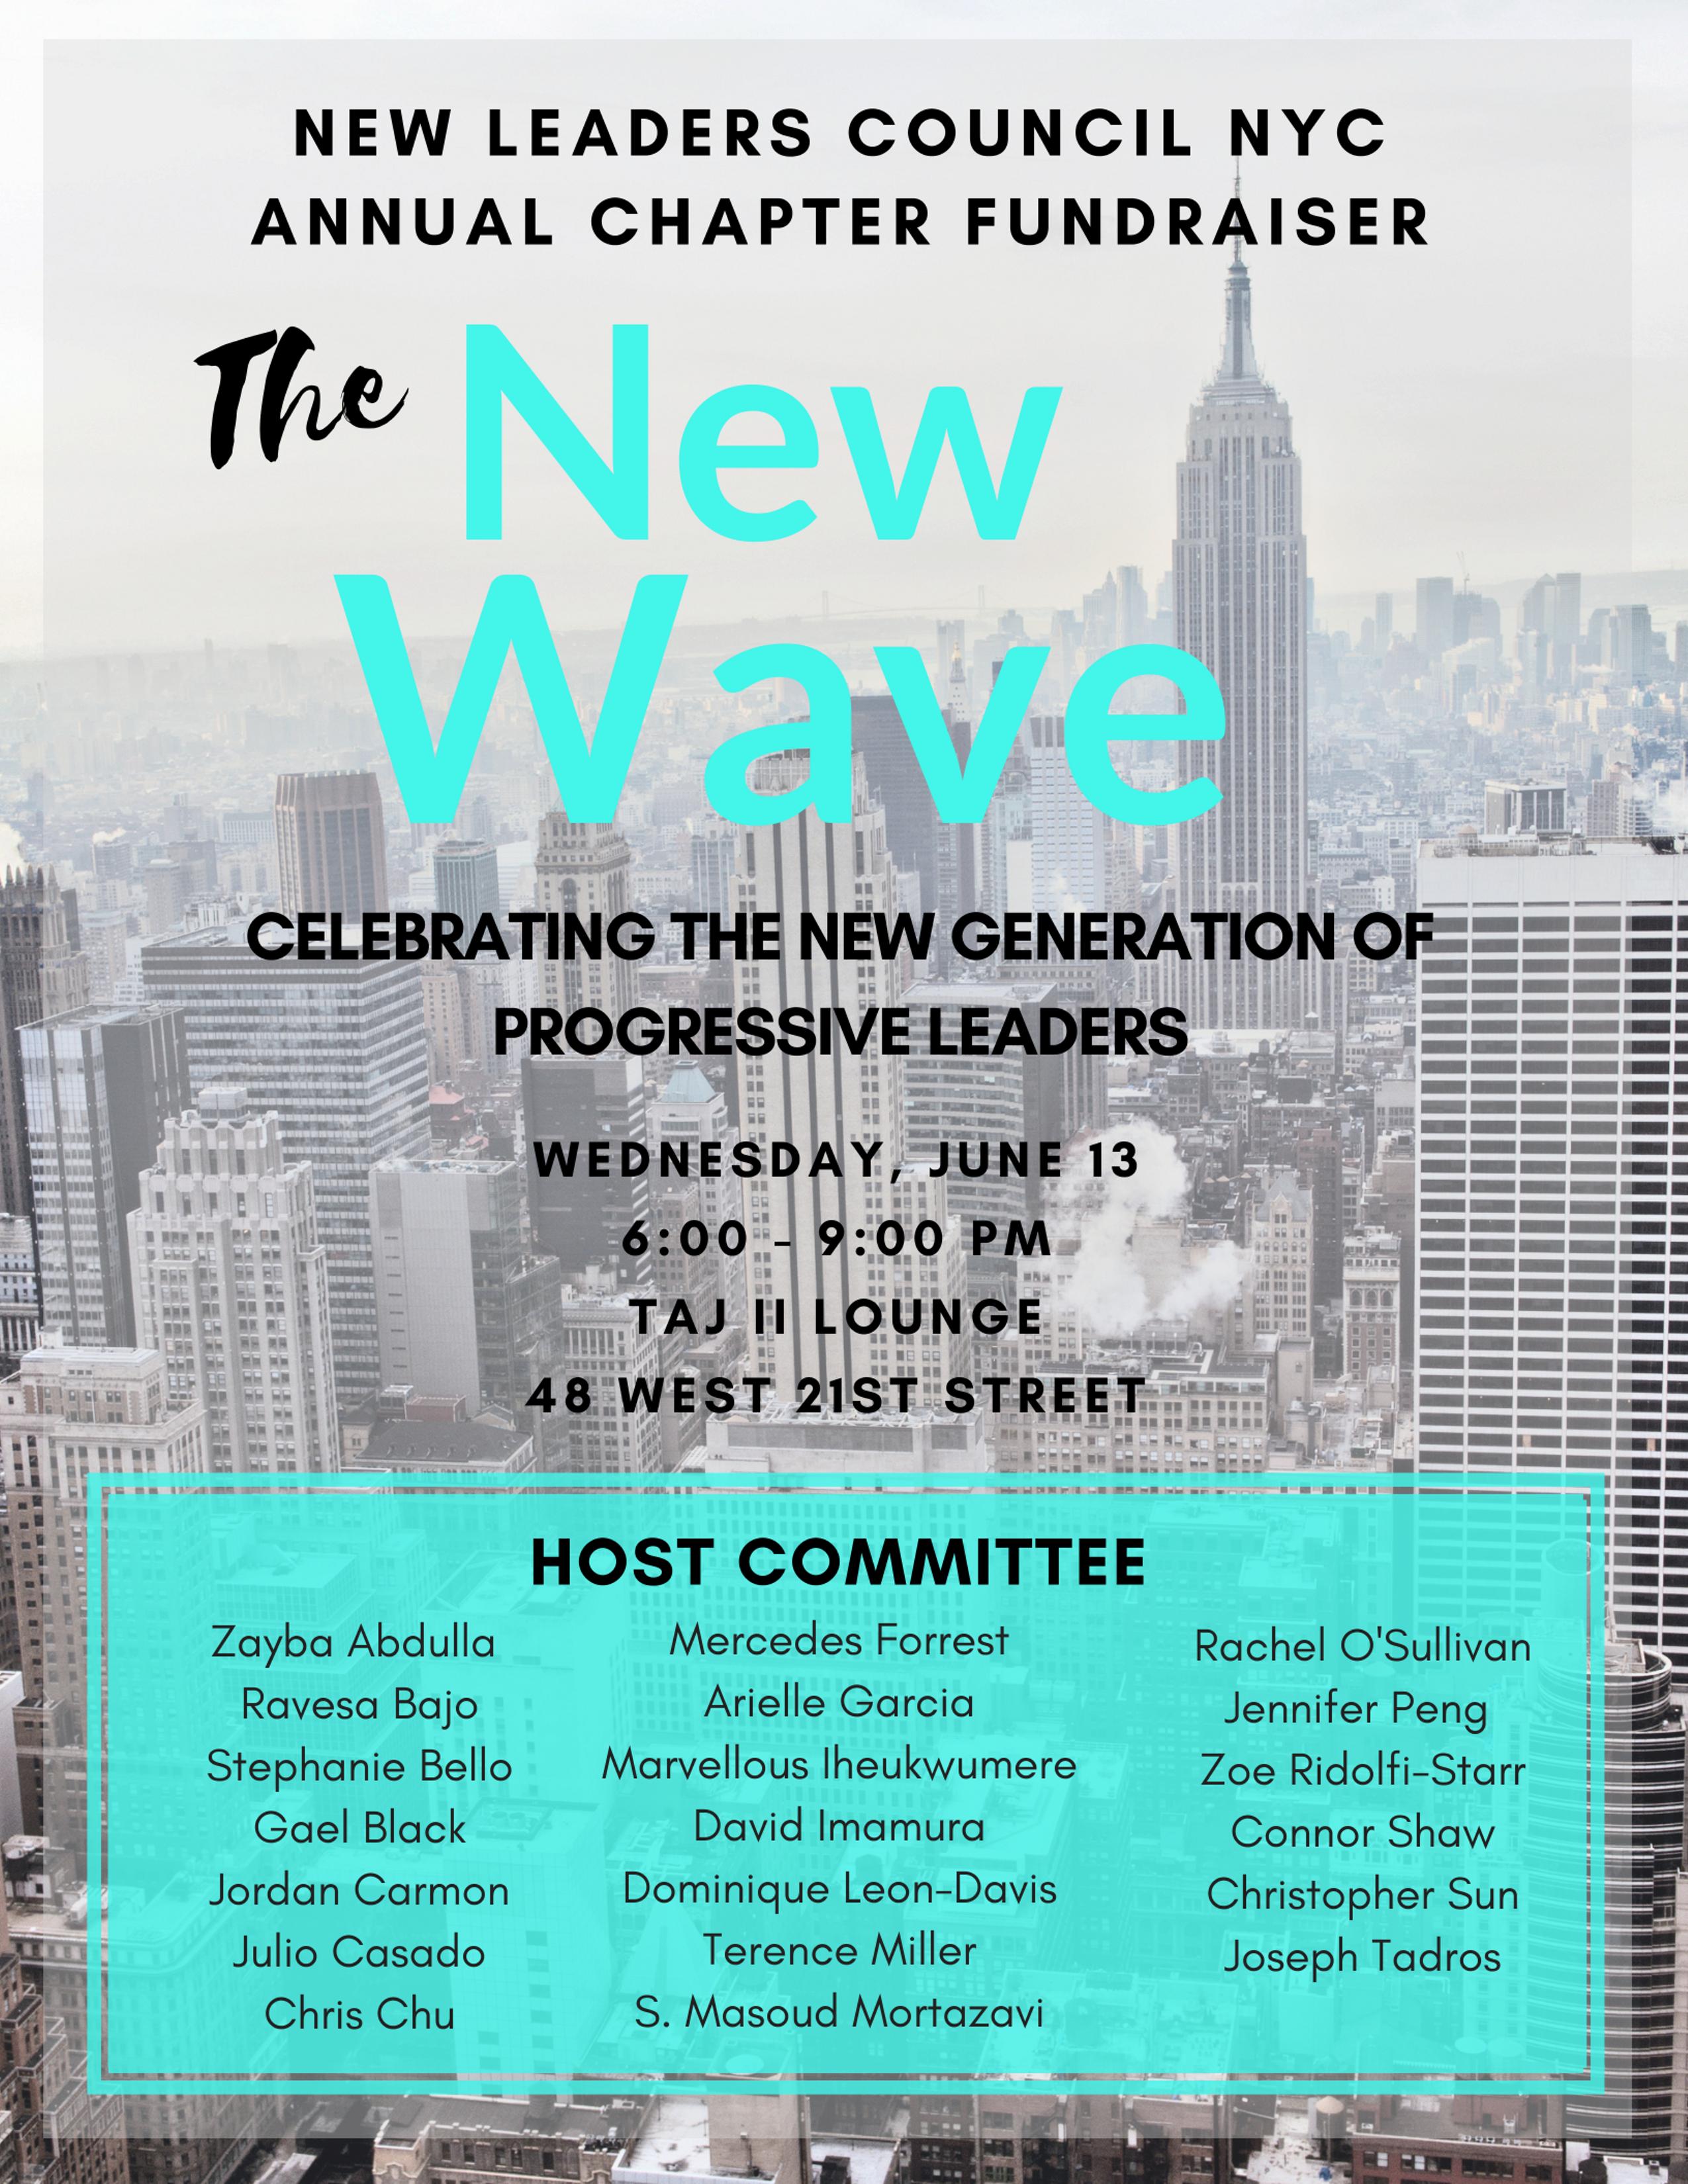 2018_NLC_NYC_Fundraiser_Flyer_(2).jpg